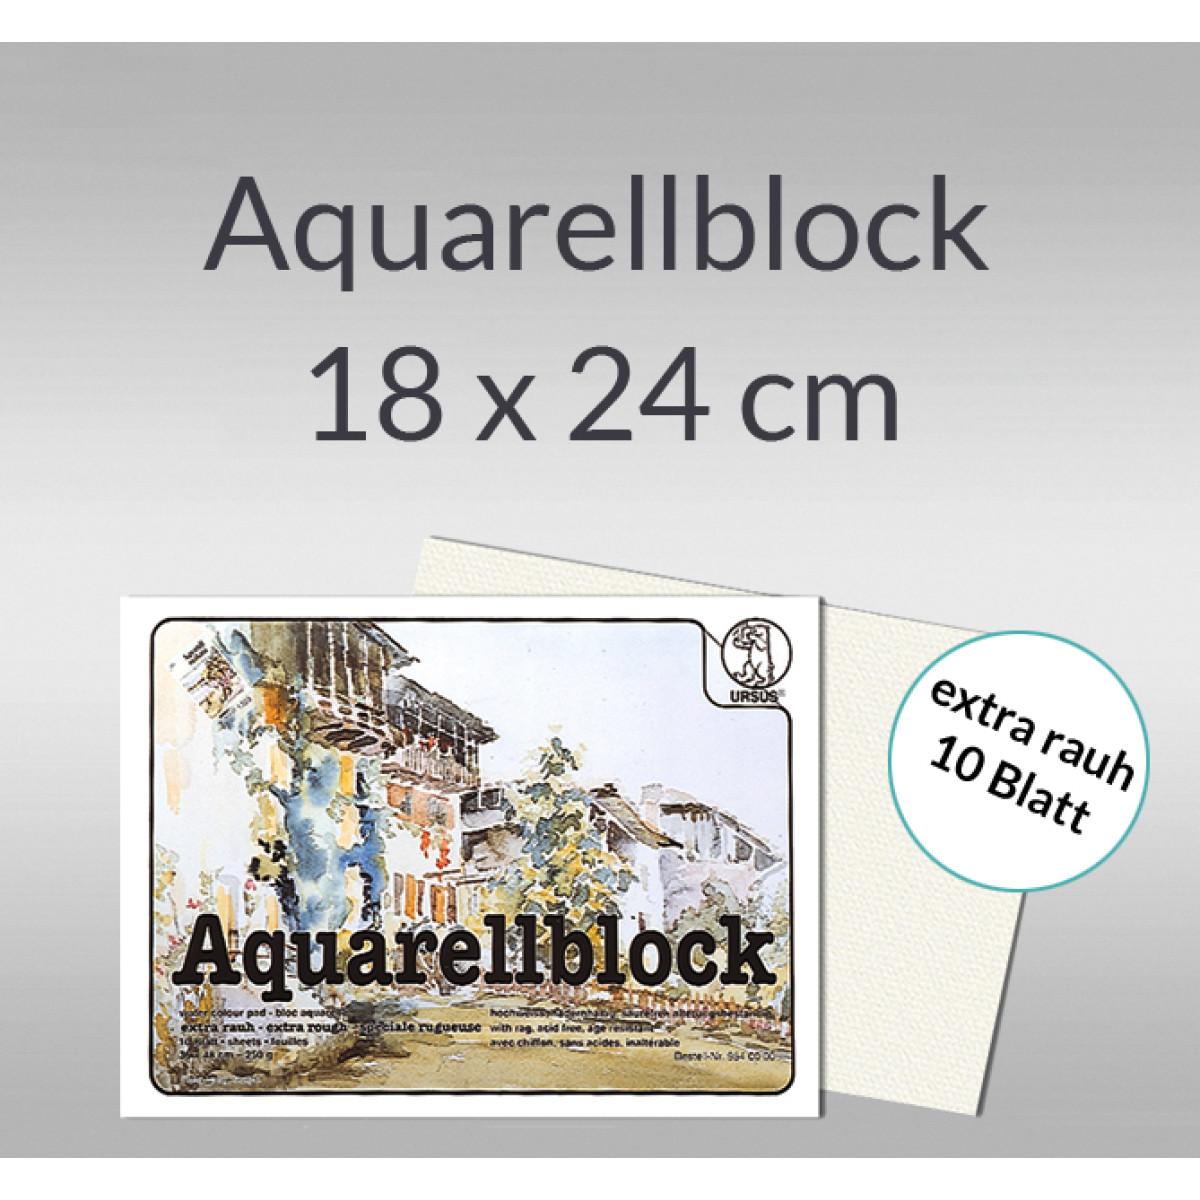 Aquarellblock extra rauh 250 g/qm 18 x 24 cm